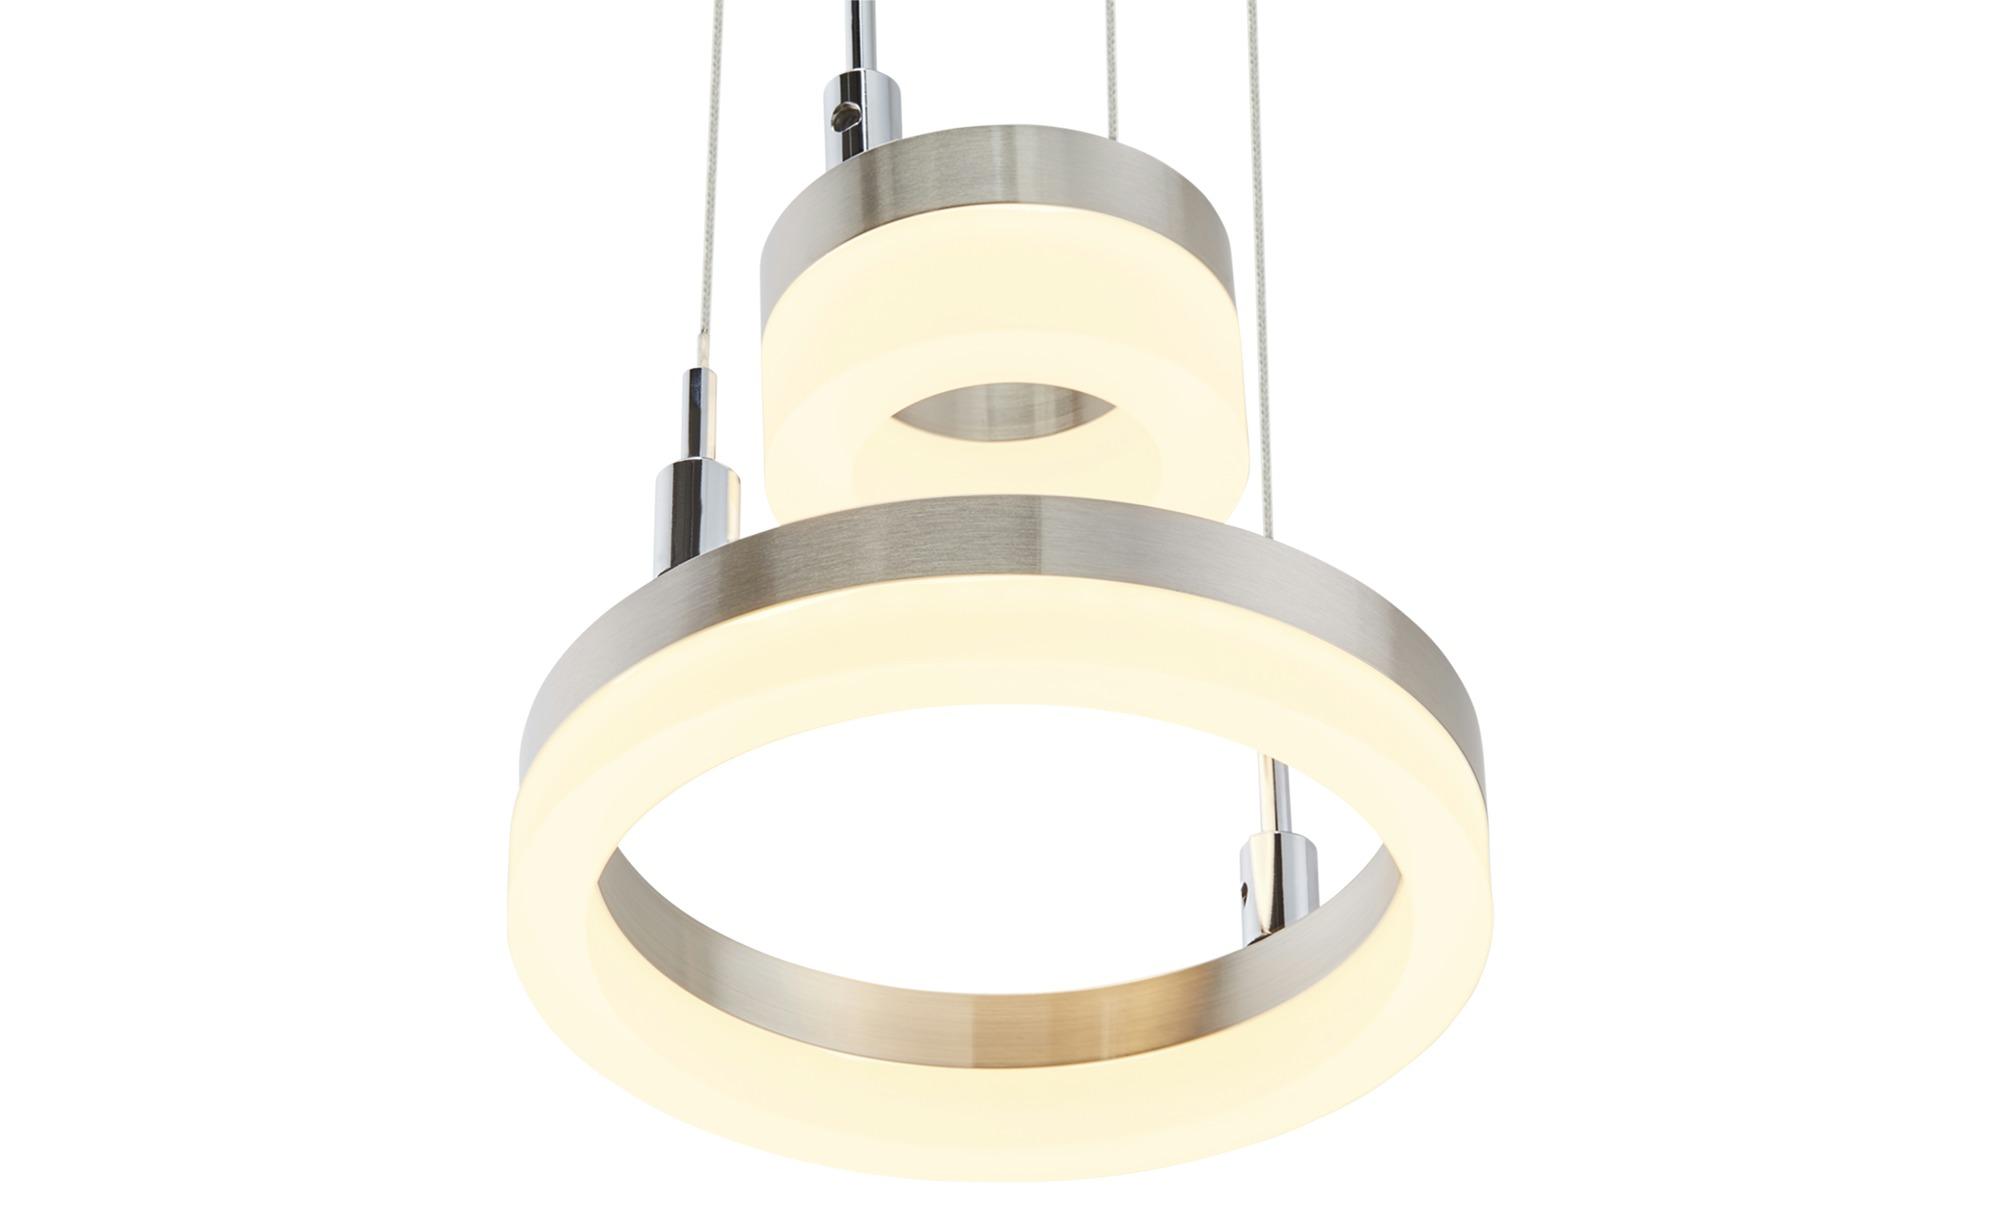 Meisterleuchten LED-Pendelleuchte, 2-flammig, nickel matt ¦ silber ¦ Maße (cm): H: 150 Ø: 18 Lampen & Leuchten > LED-Leuchten > LED-Pendelleuchten - Höffner